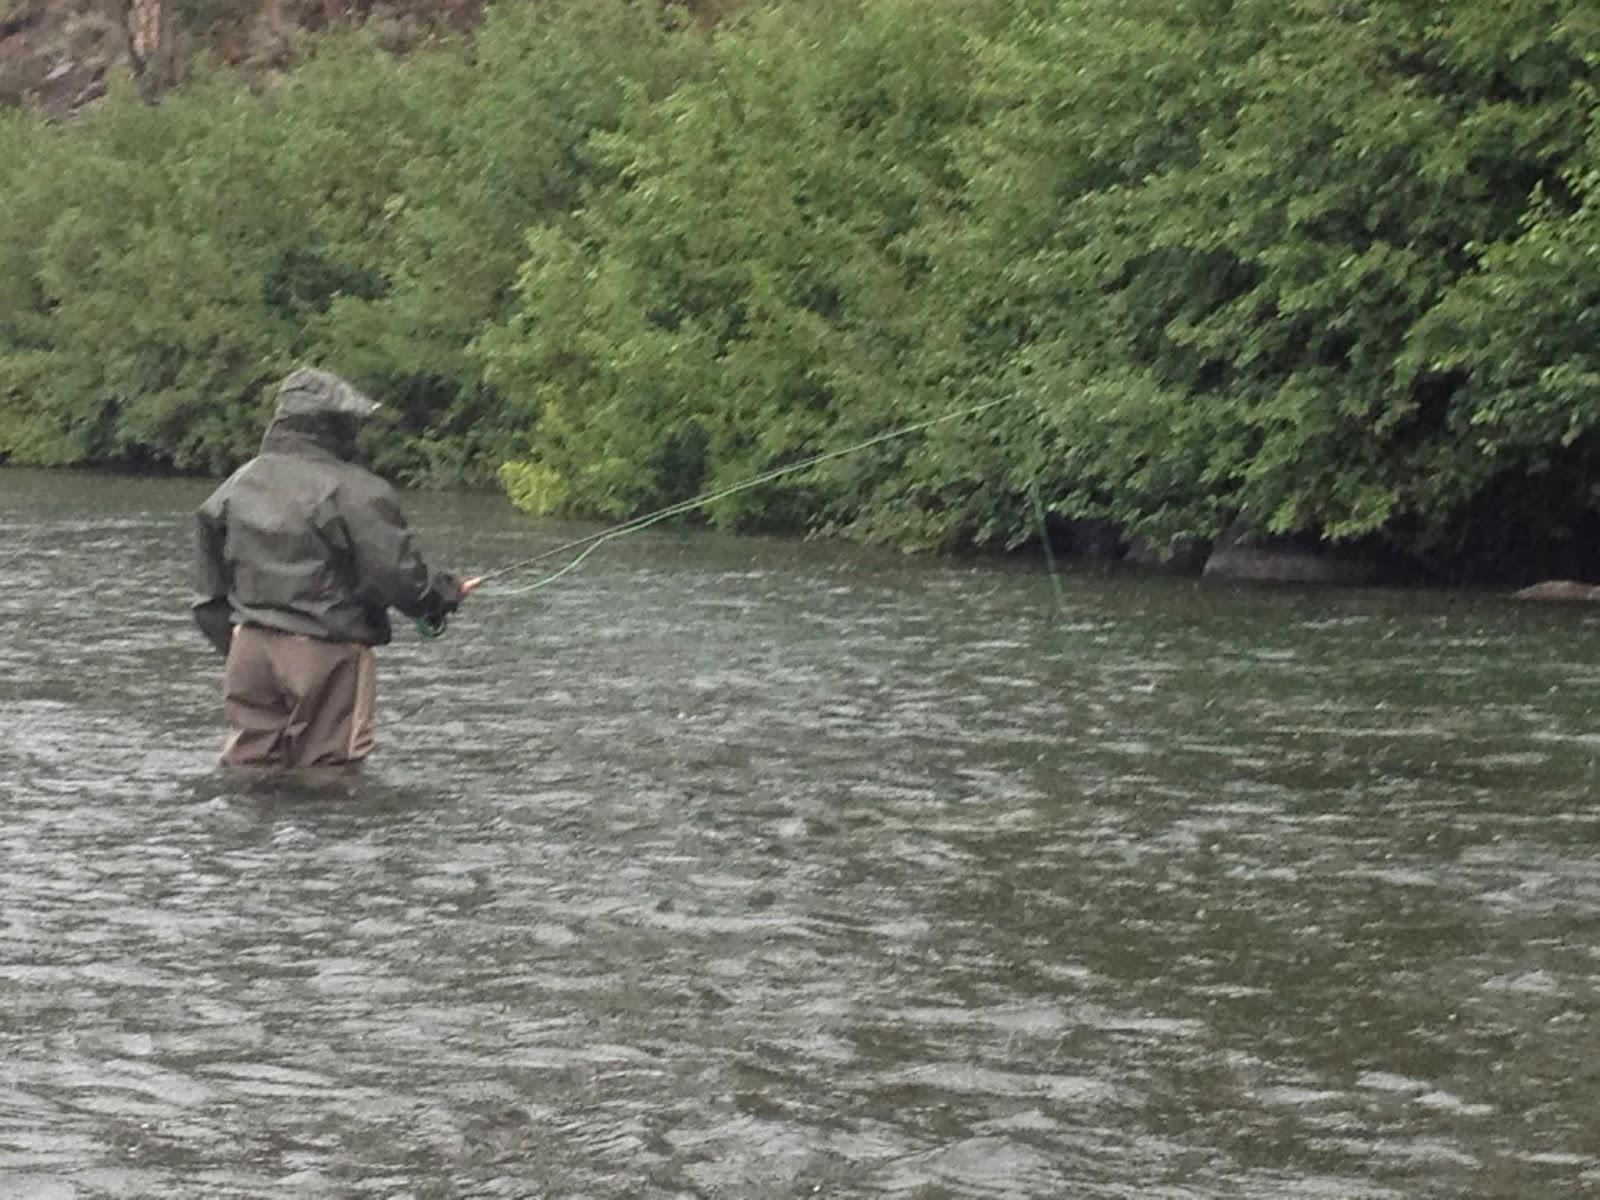 Northern sierra fly fishing northern sierra report 8 8 14 for Sierra fly fishing